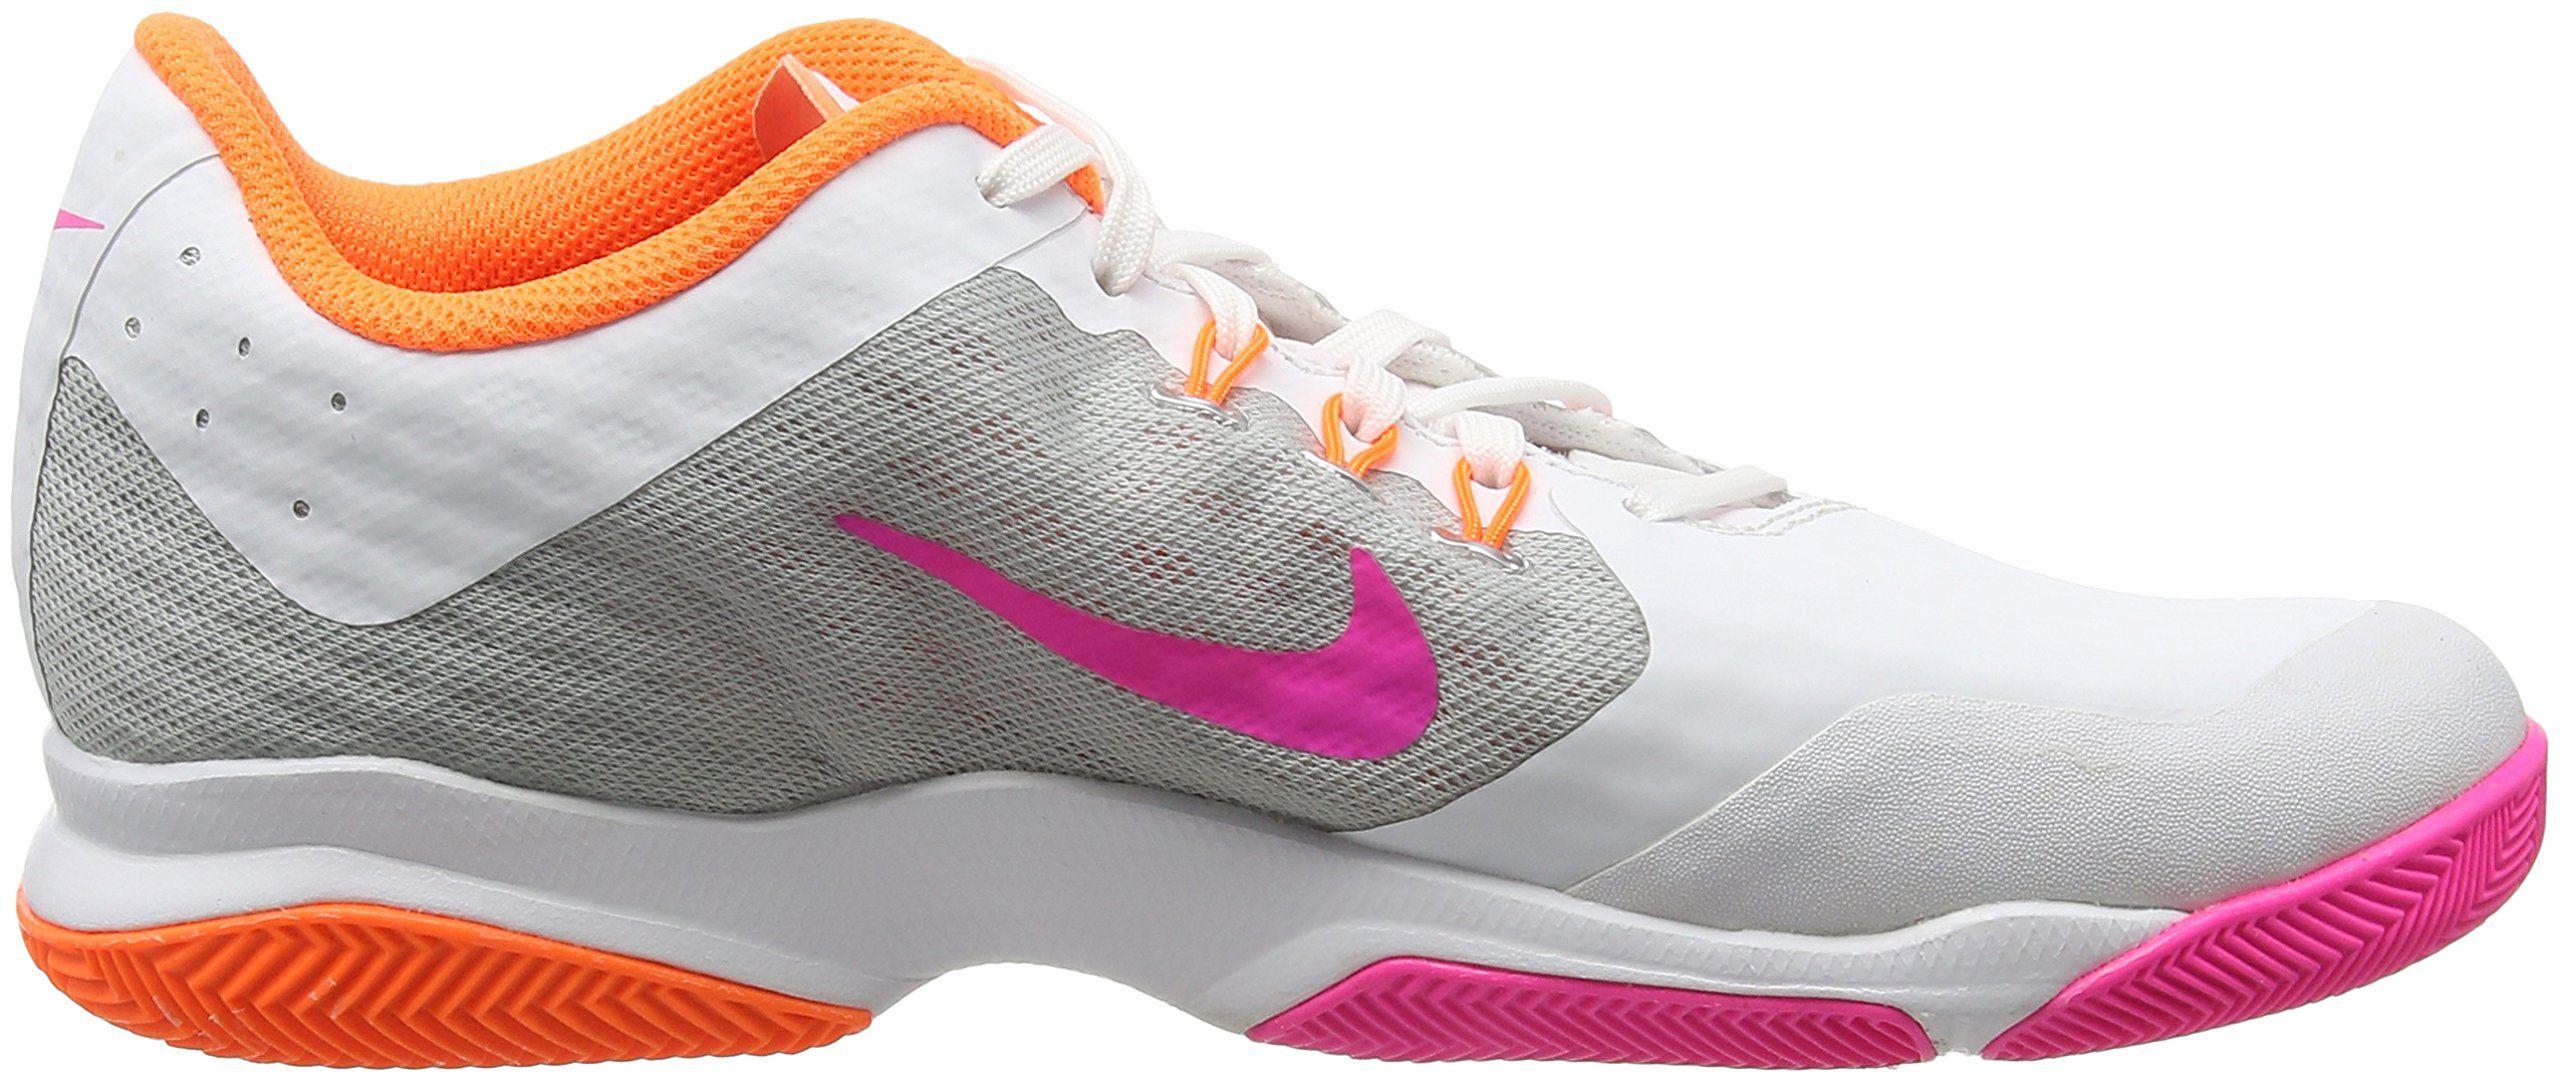 Nike Air Zoom Ultra White/Metallic Silver/Total Orange